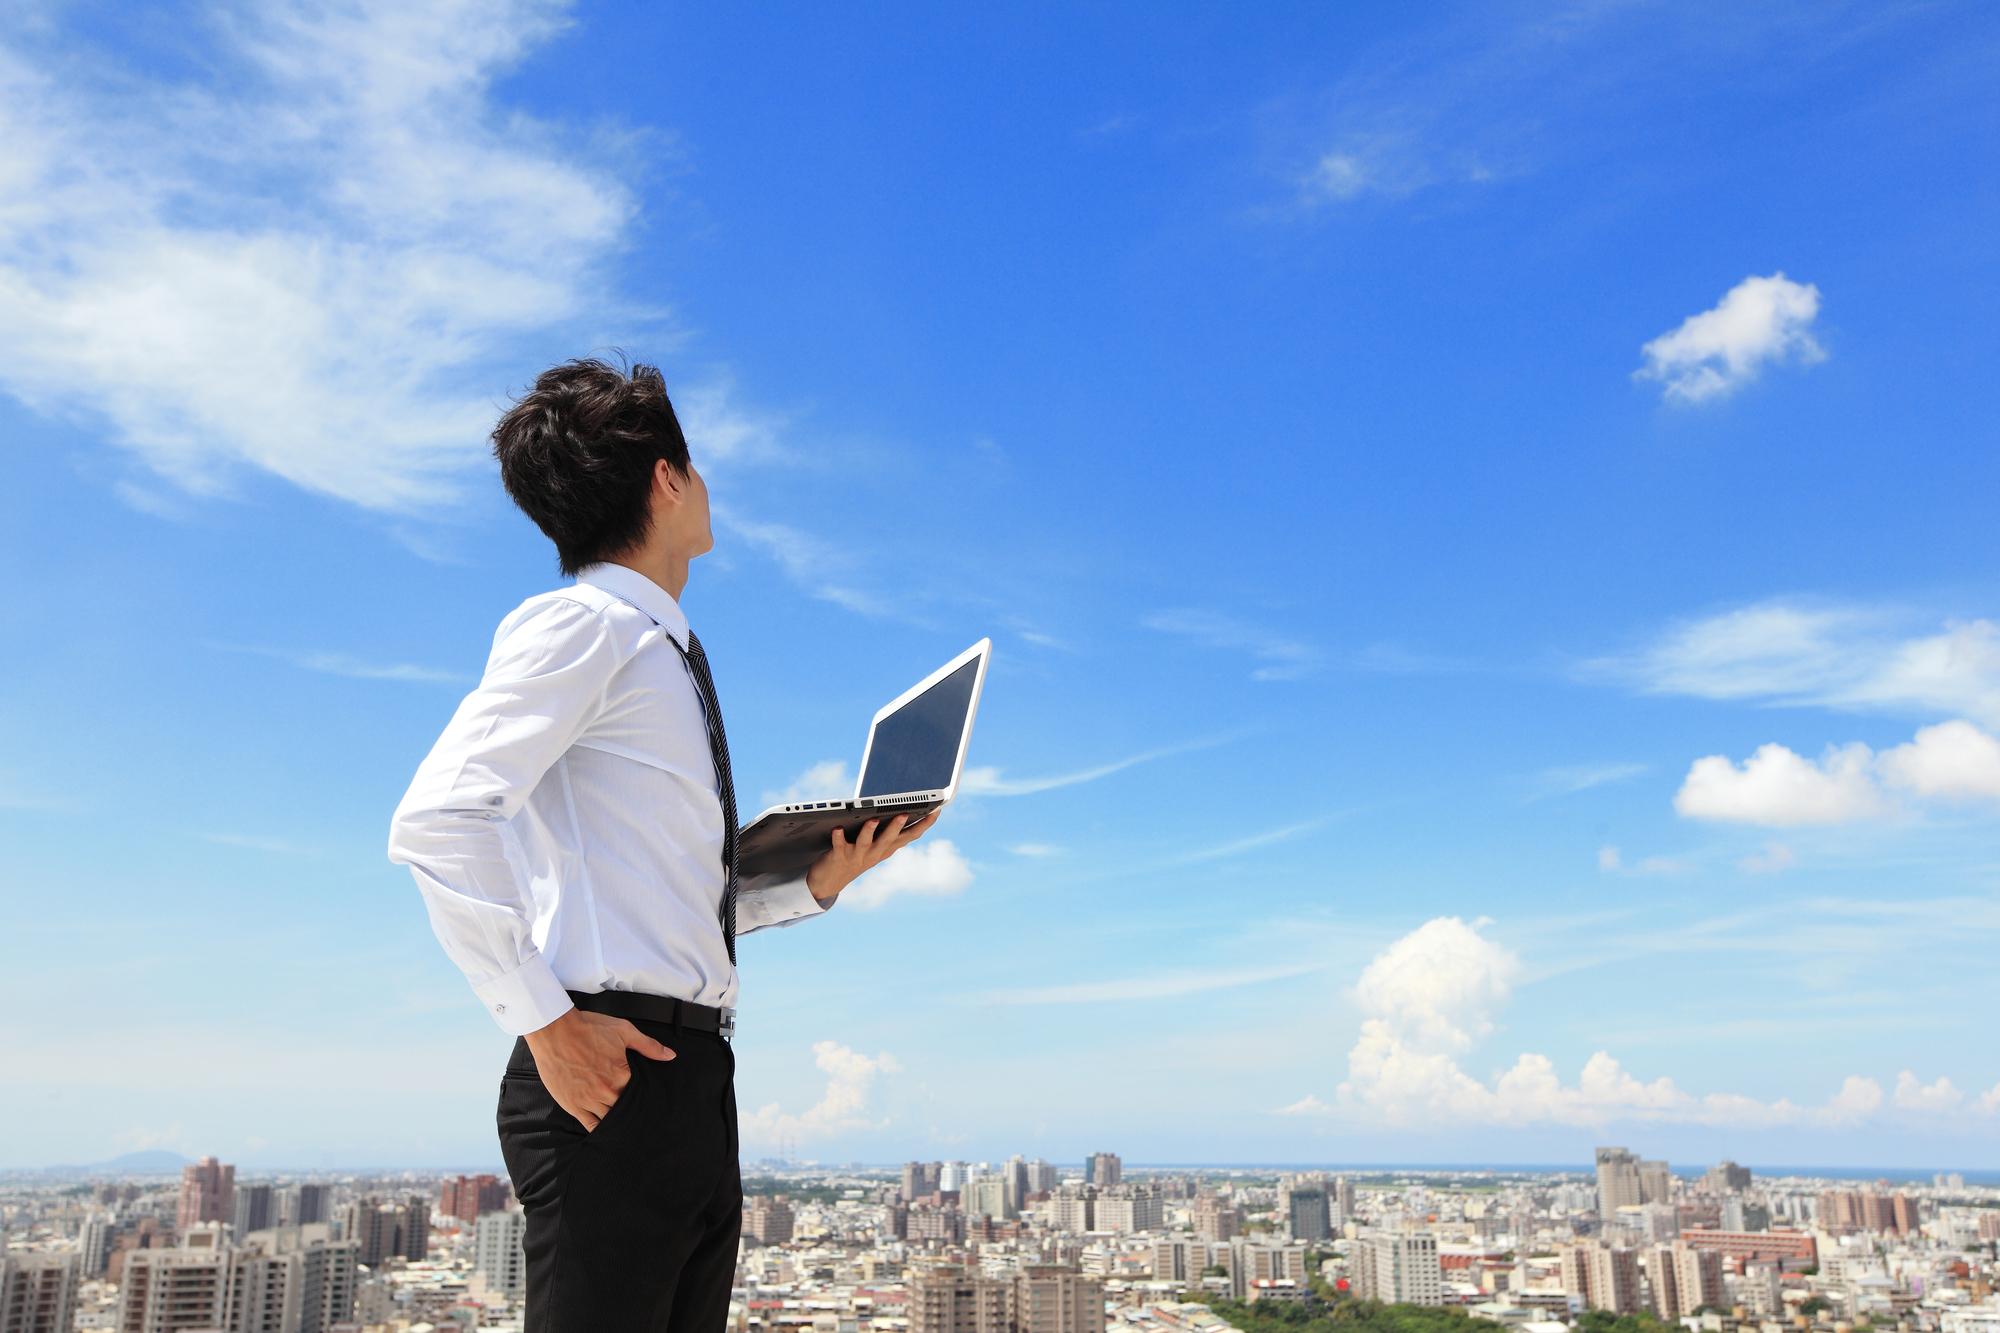 【参加決定】新潟県社会保険労務士会主催 「電子申請フェスティバル」